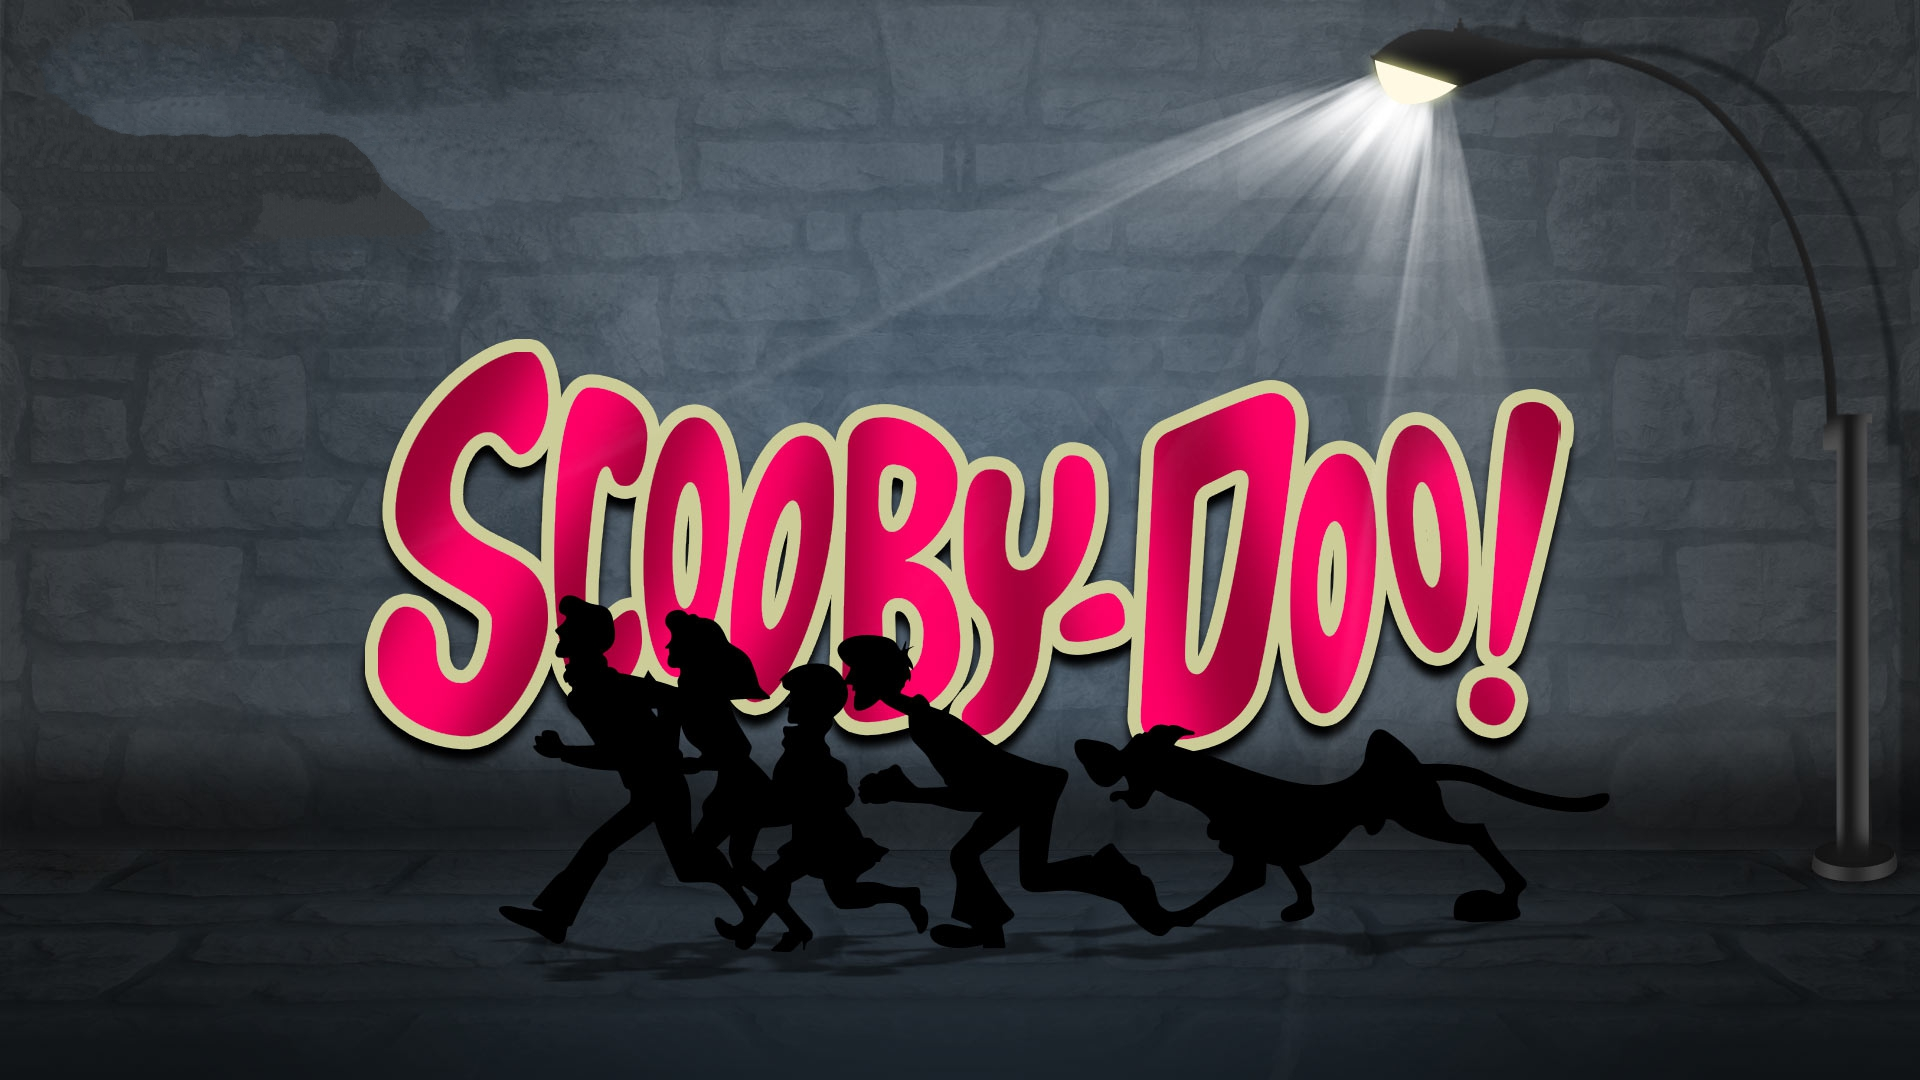 Cute Cartoon Wallpapers For Pc Hd Scooby Doo Wallpapers Pixelstalk Net